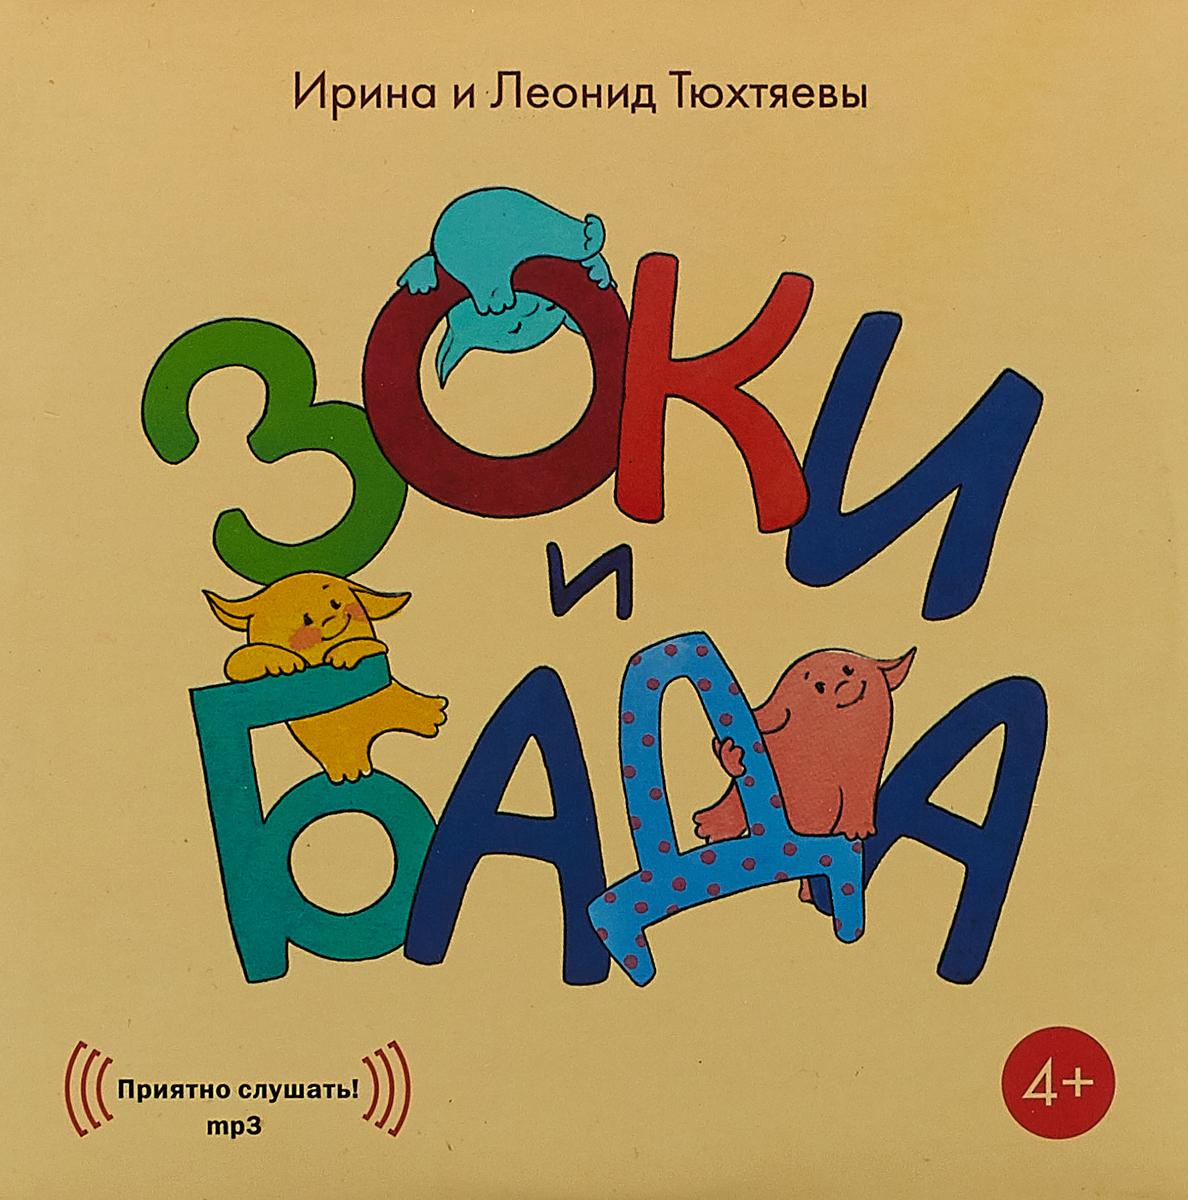 И. Тюхтяева, Л. Тюхтяев Зоки и Бада (аудиокнига MP3)